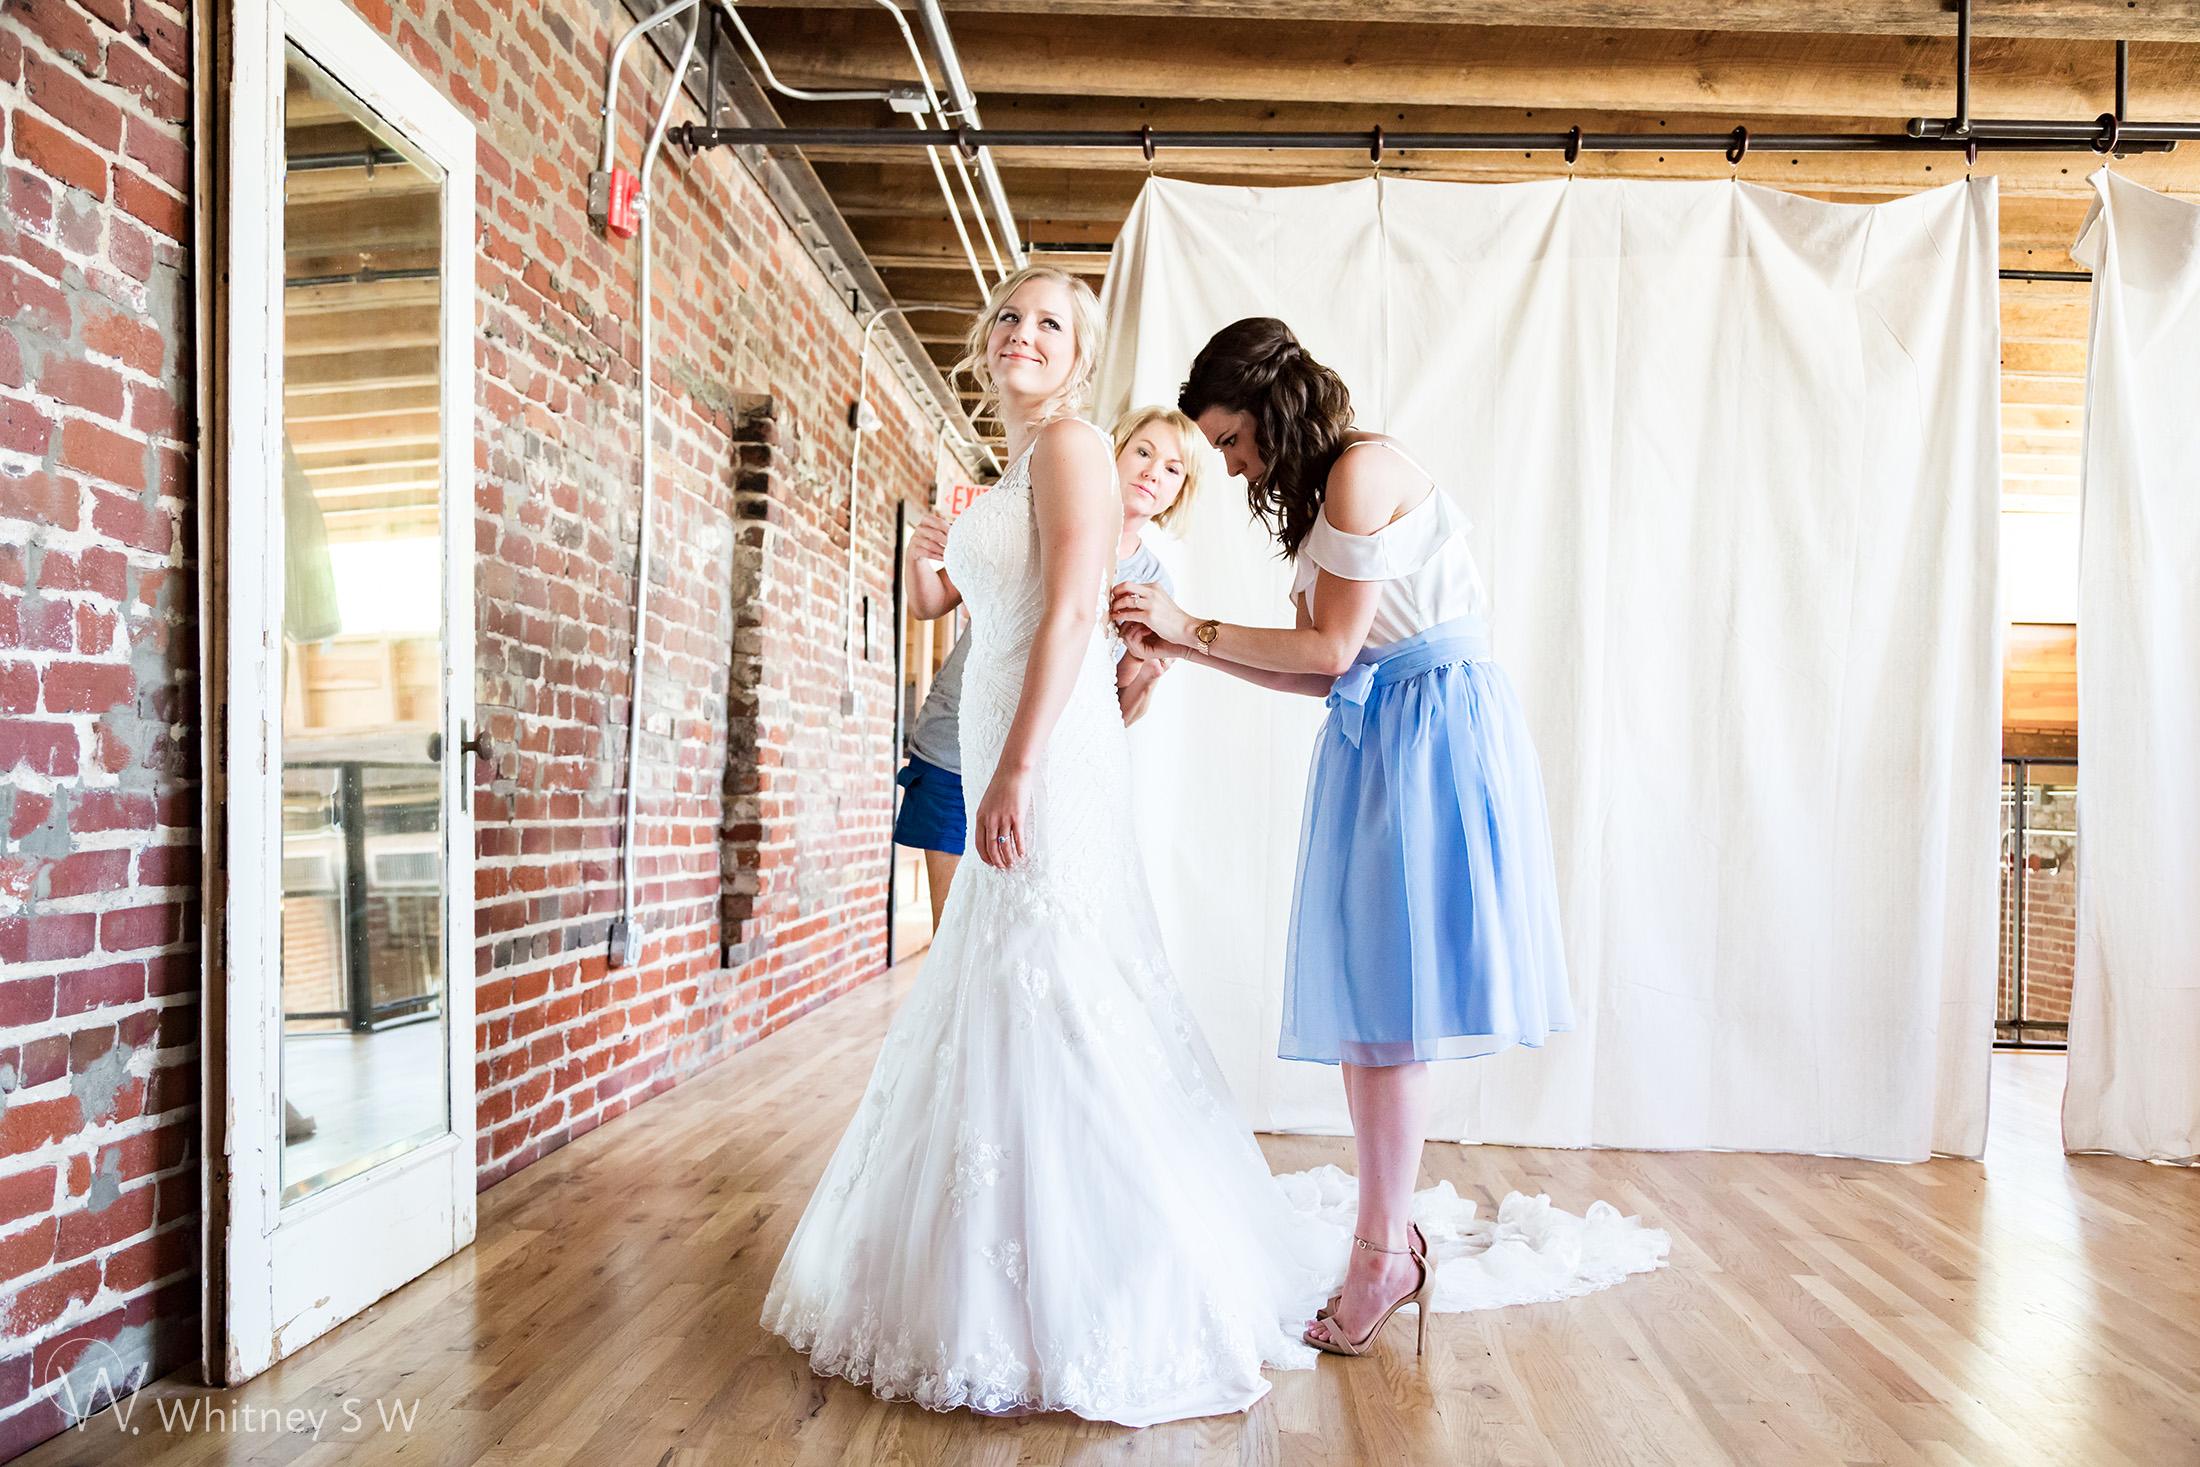 Morgan & Kaivon Wedding - Photography by Whitney S Williams whitneysw (27).jpg